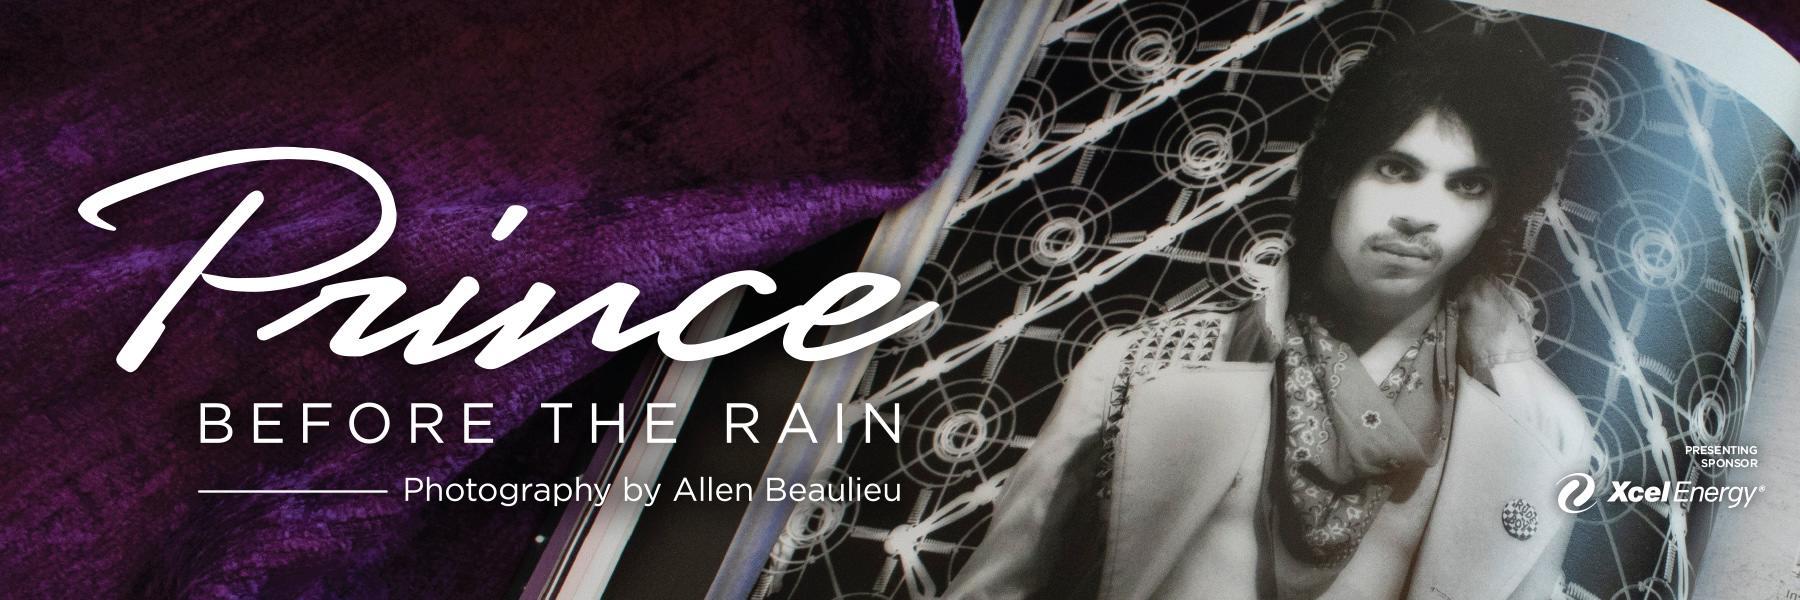 Prince before the rain.